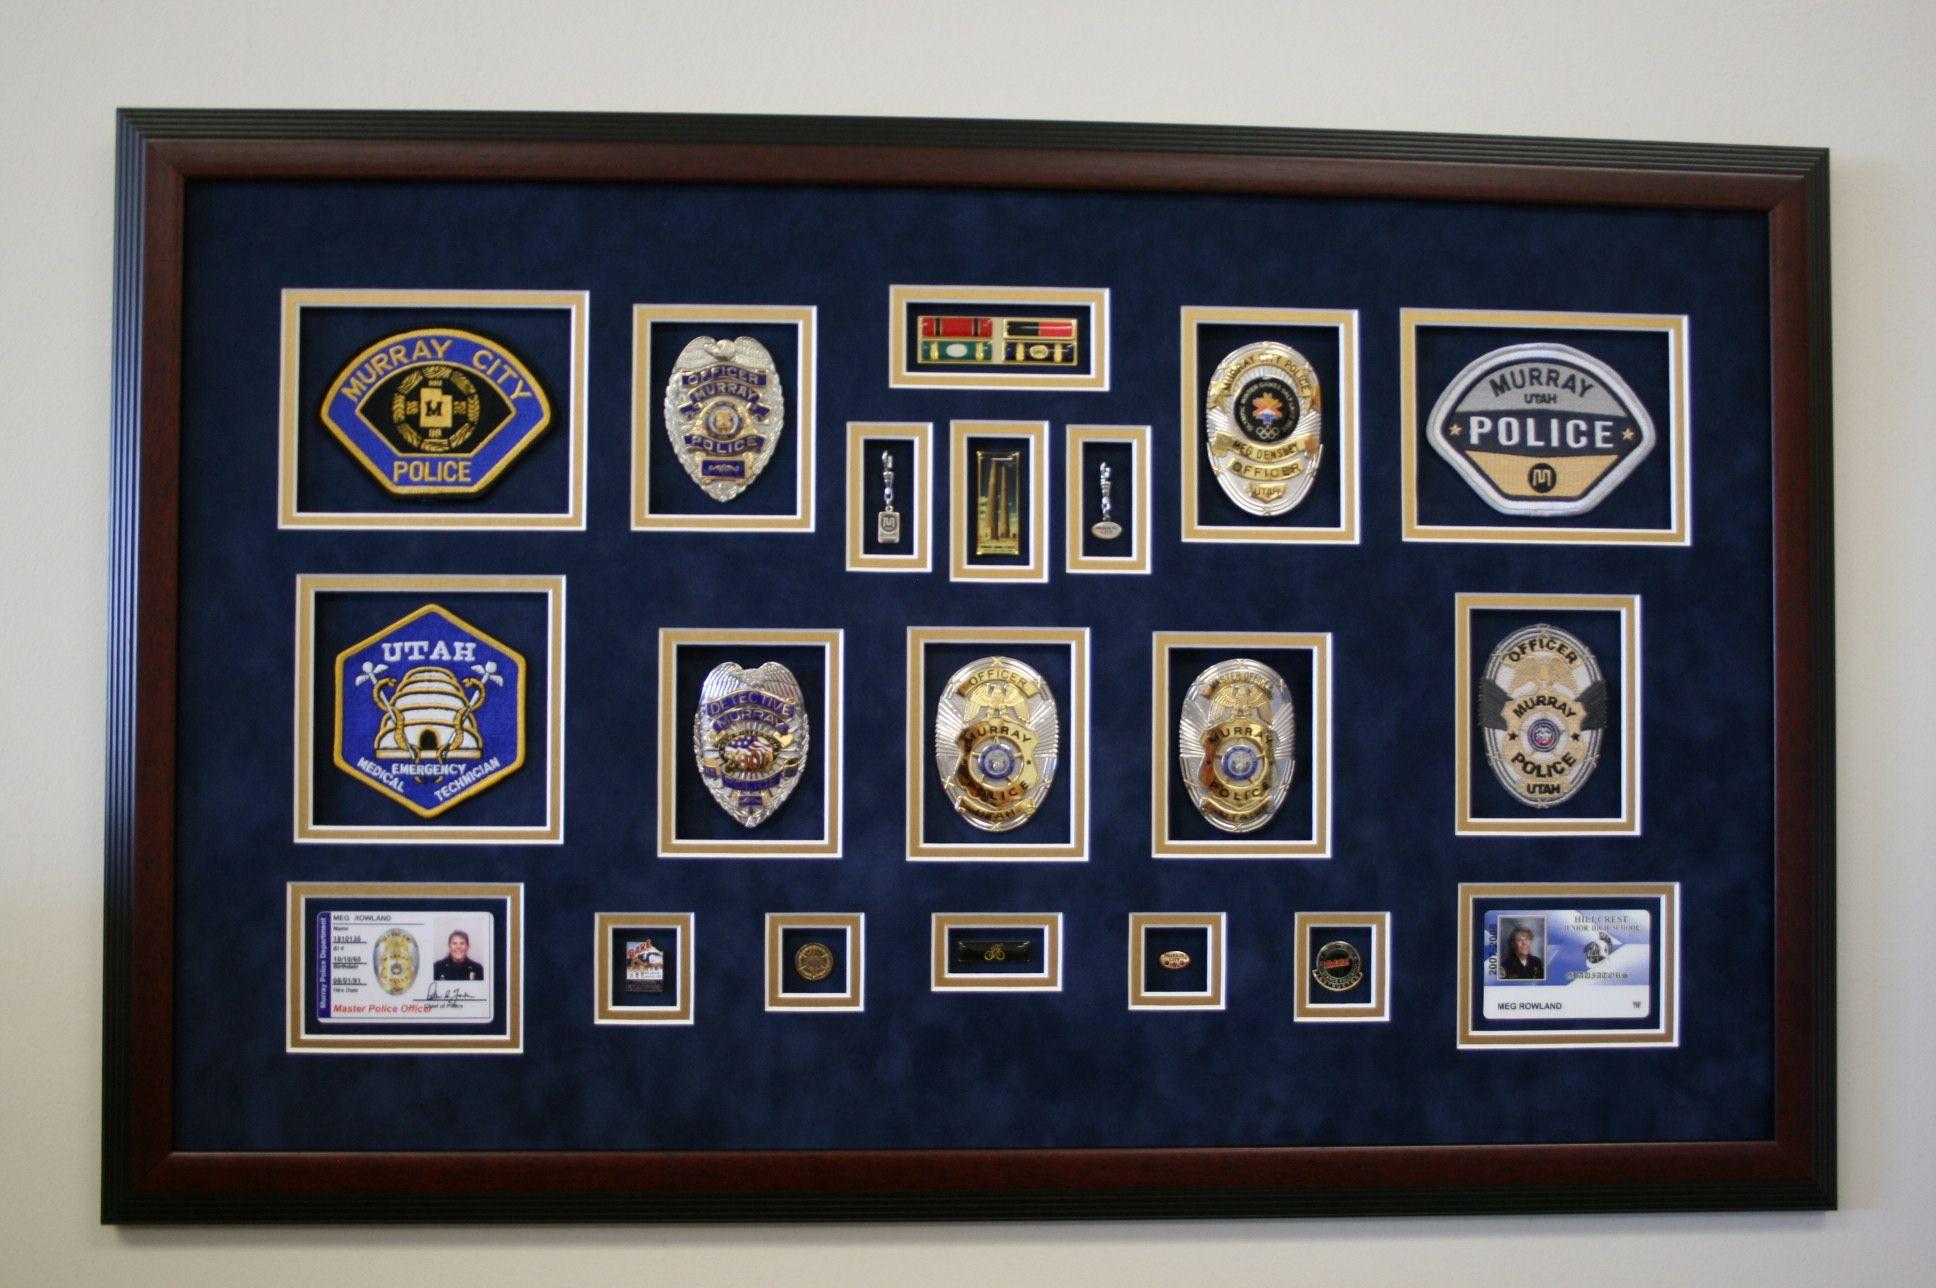 Custom frame badges as a lovely retirement gift for the police custom frame badges as a lovely retirement gift for the police officer in your life jeuxipadfo Choice Image